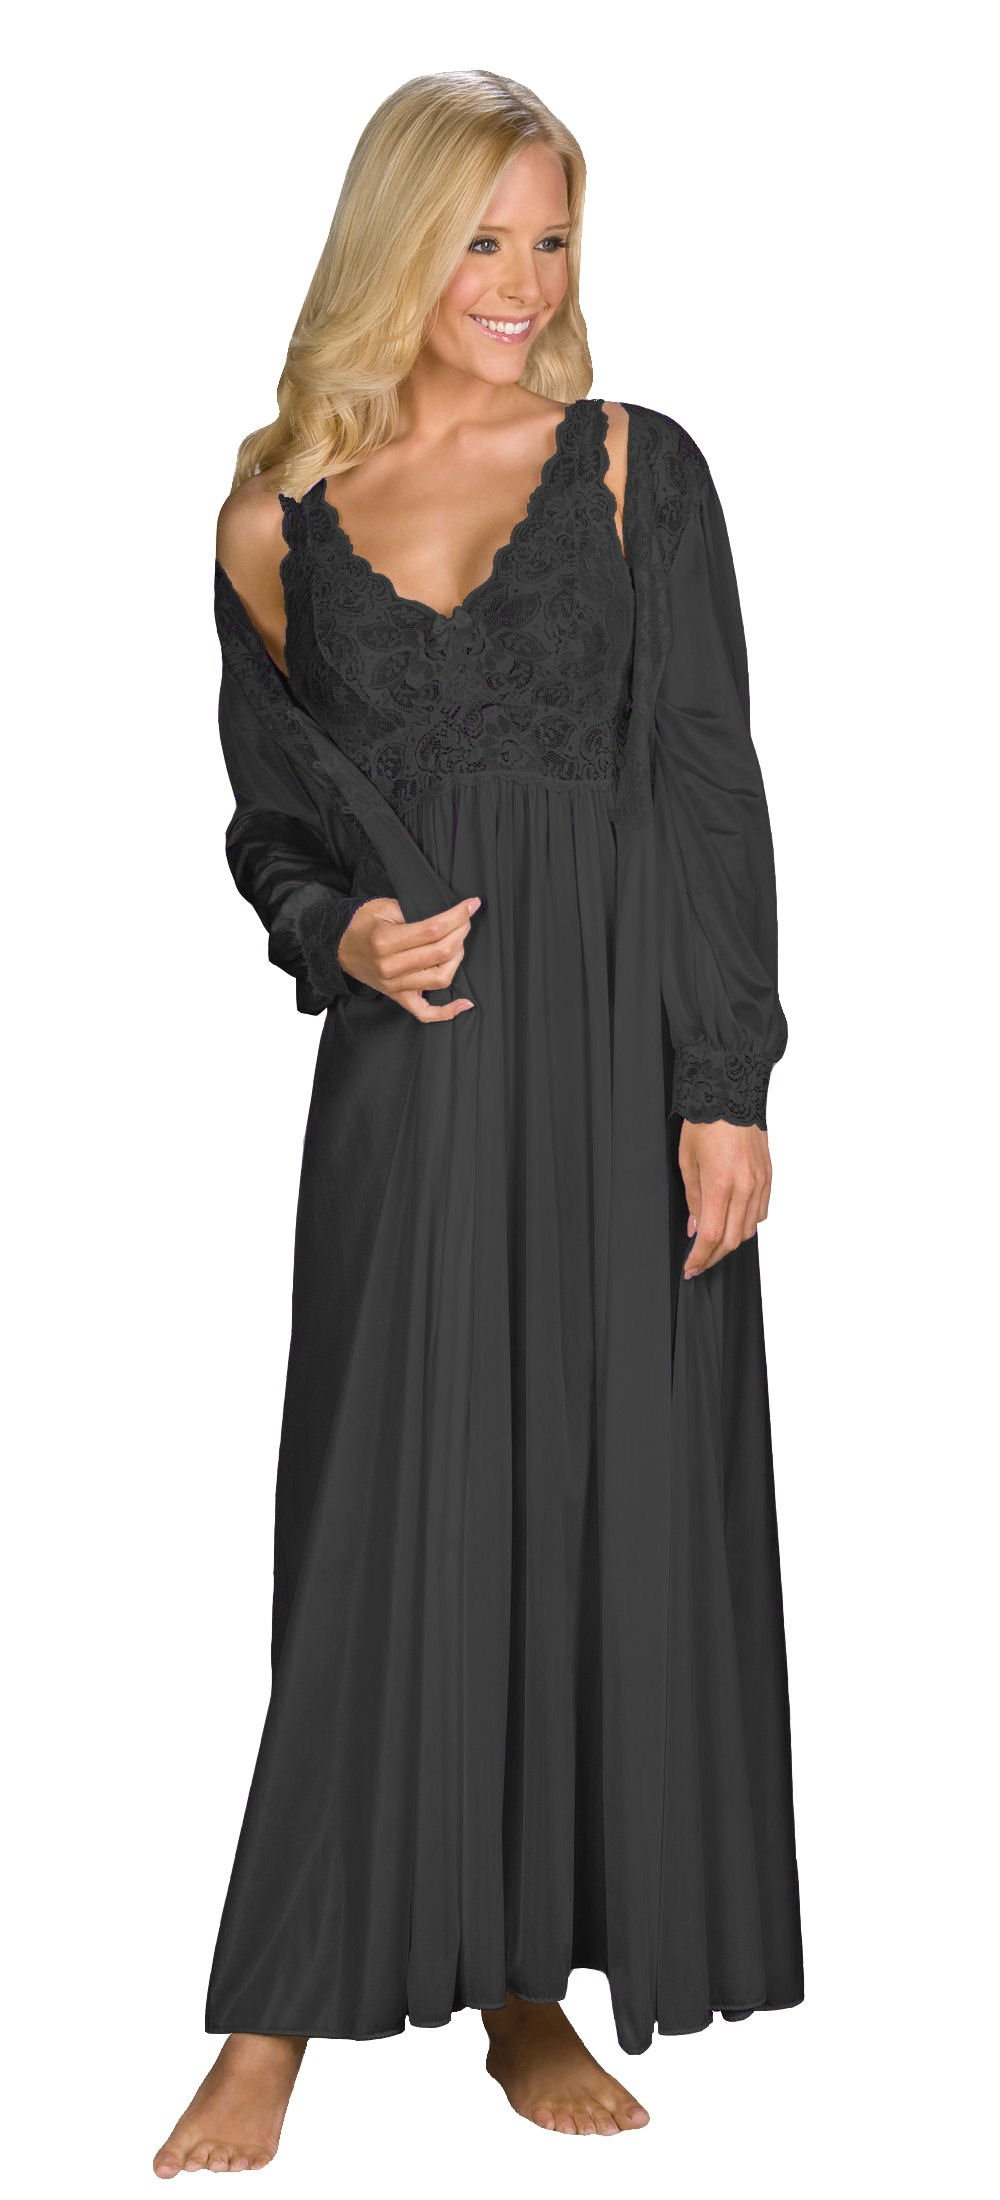 Shadowline Silhouette Gown and Peignoir Set (51737), Black, 1X